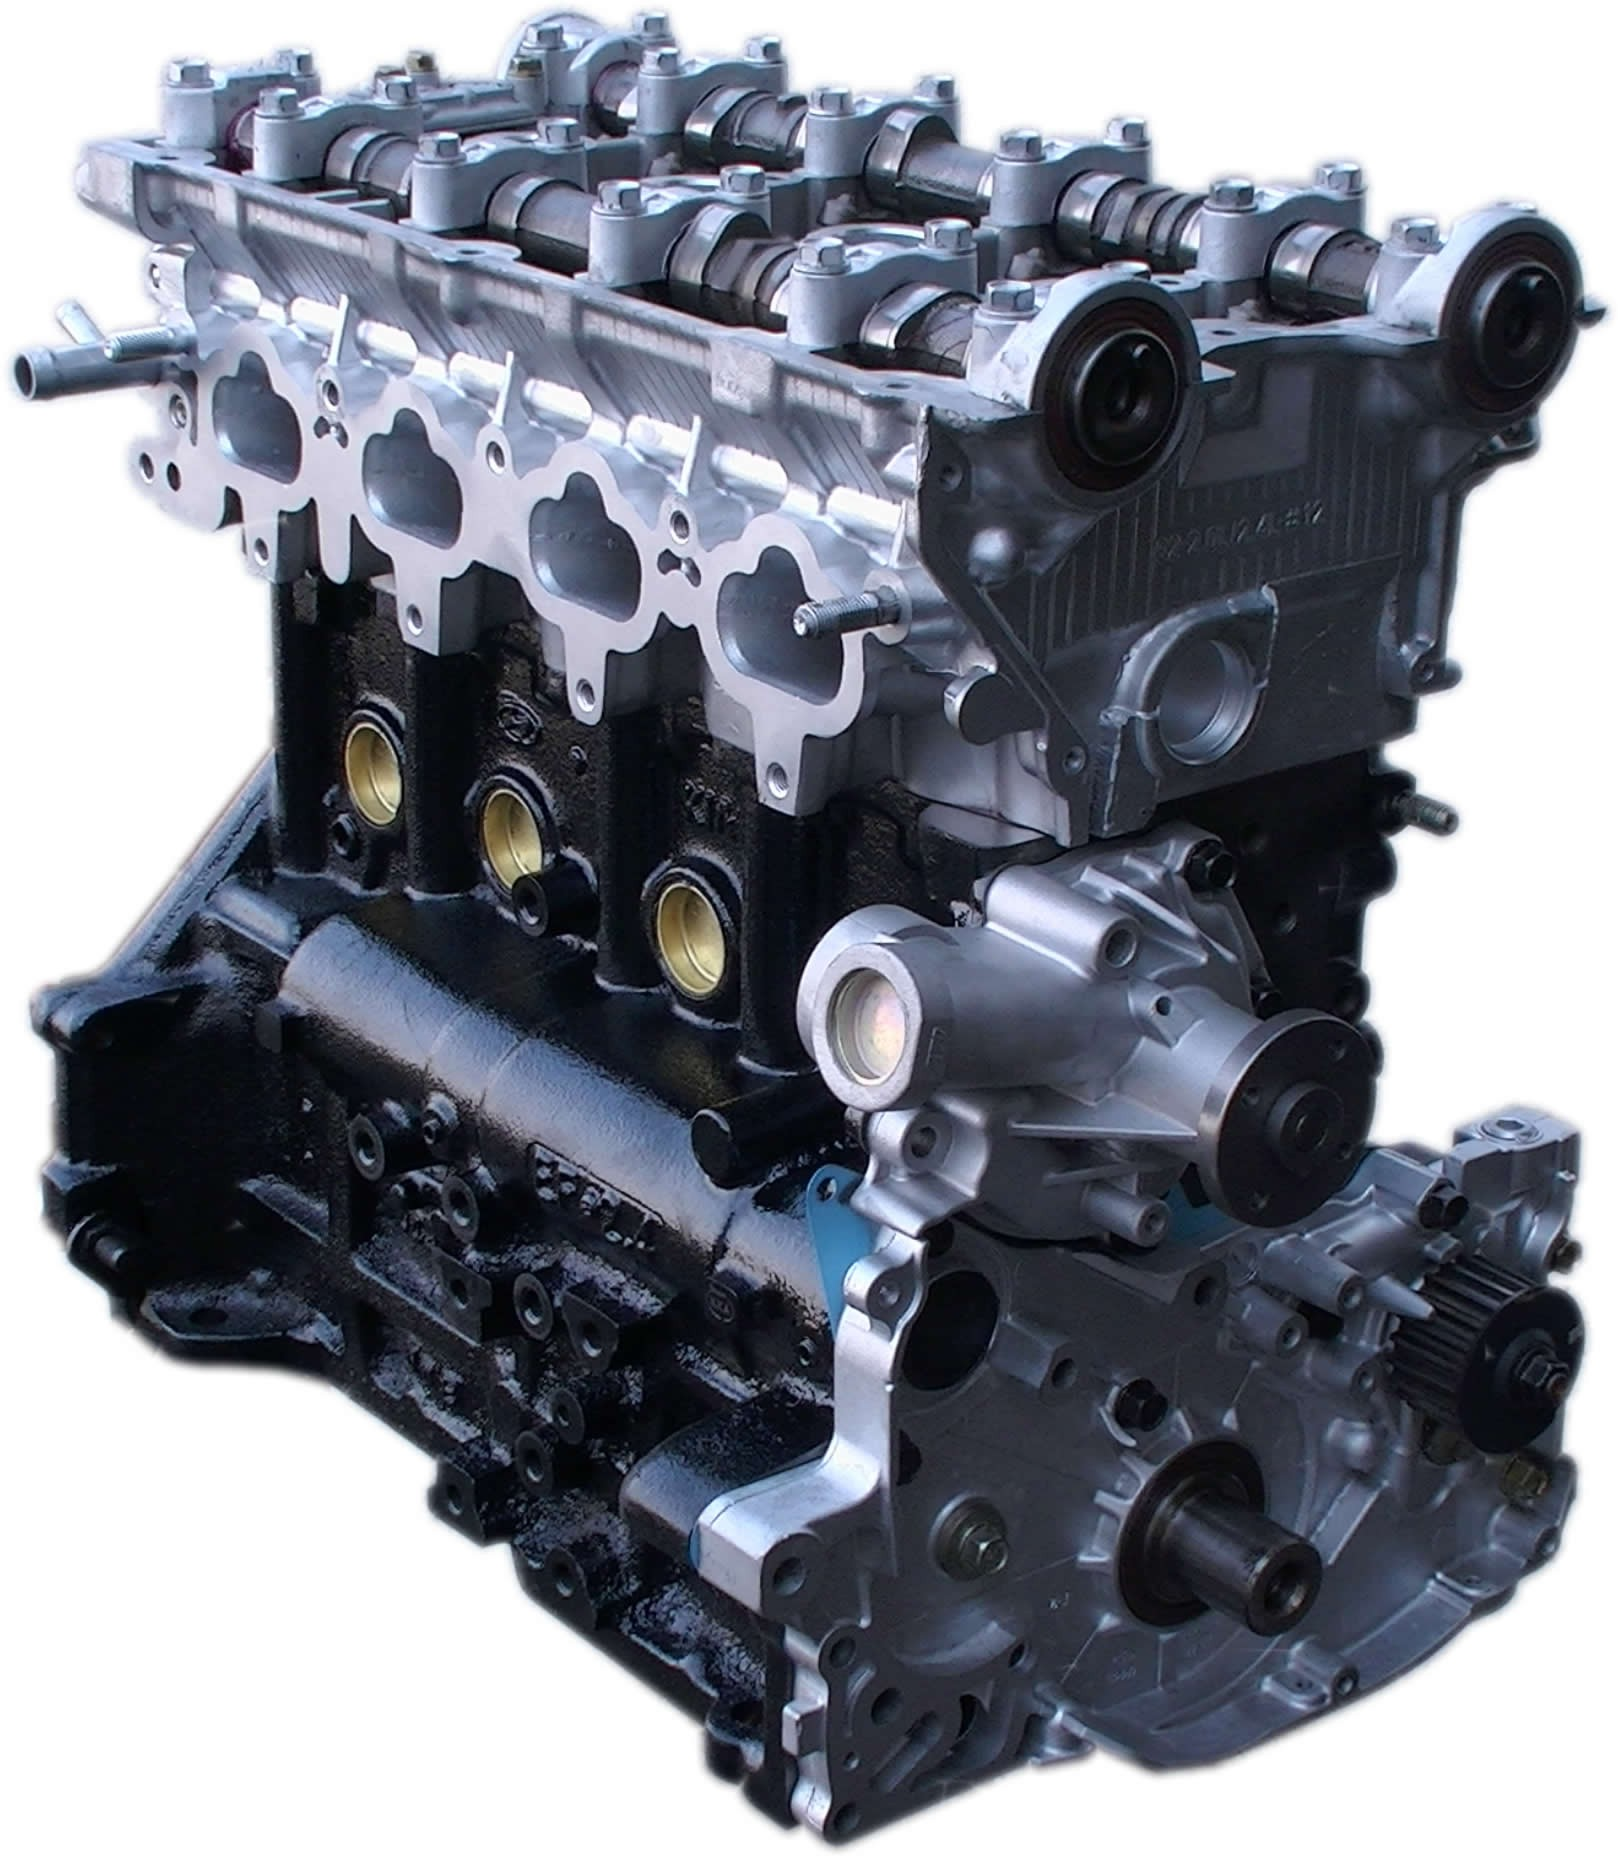 mitsubishi 2 4l engine diagram 2007 chevy avalanche parts rebuilt 01 05 hyundai santa fe 4cyl dohc  kar